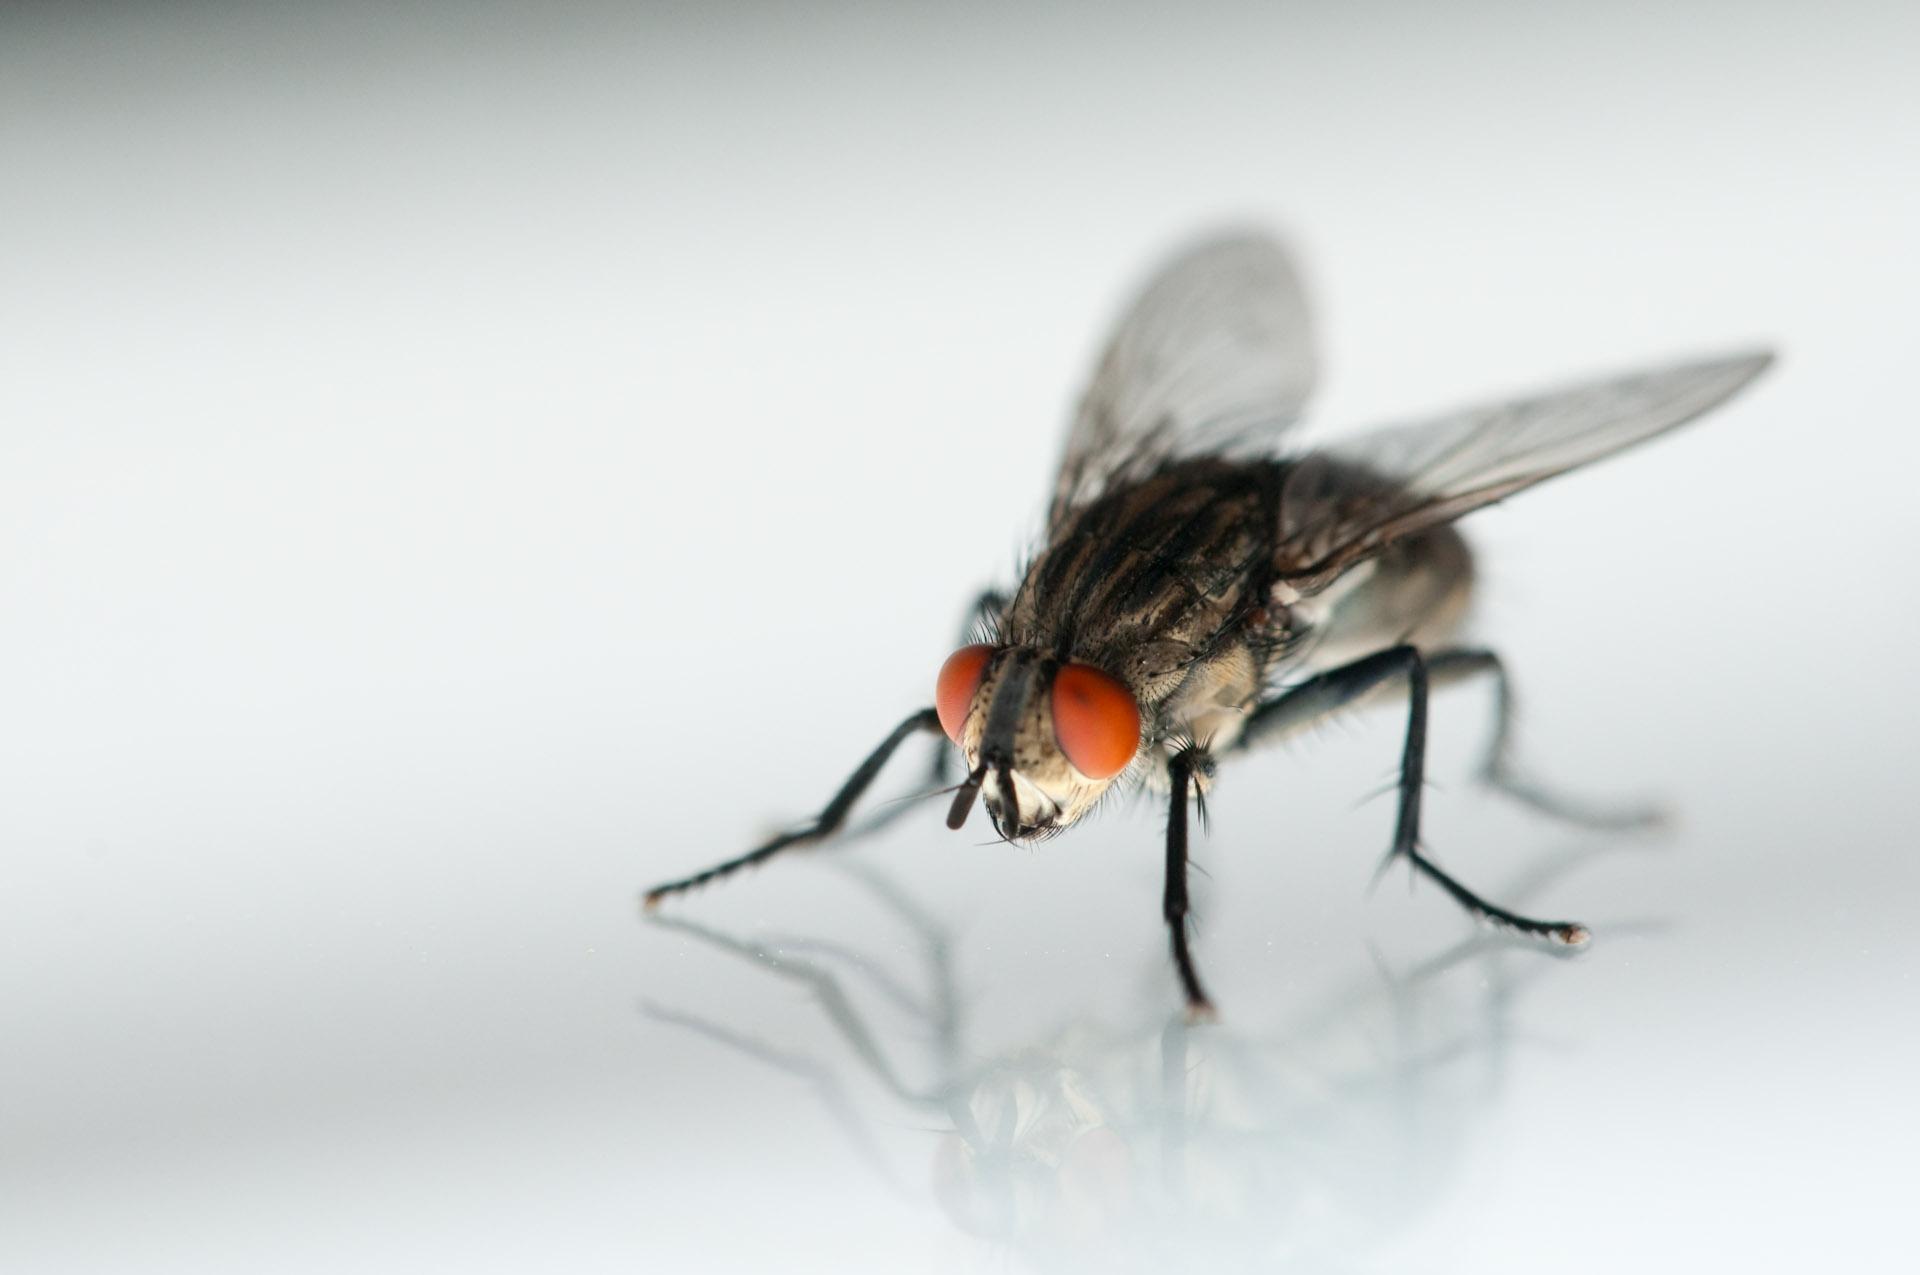 フリー写真素材 動物 昆虫 蝿・...